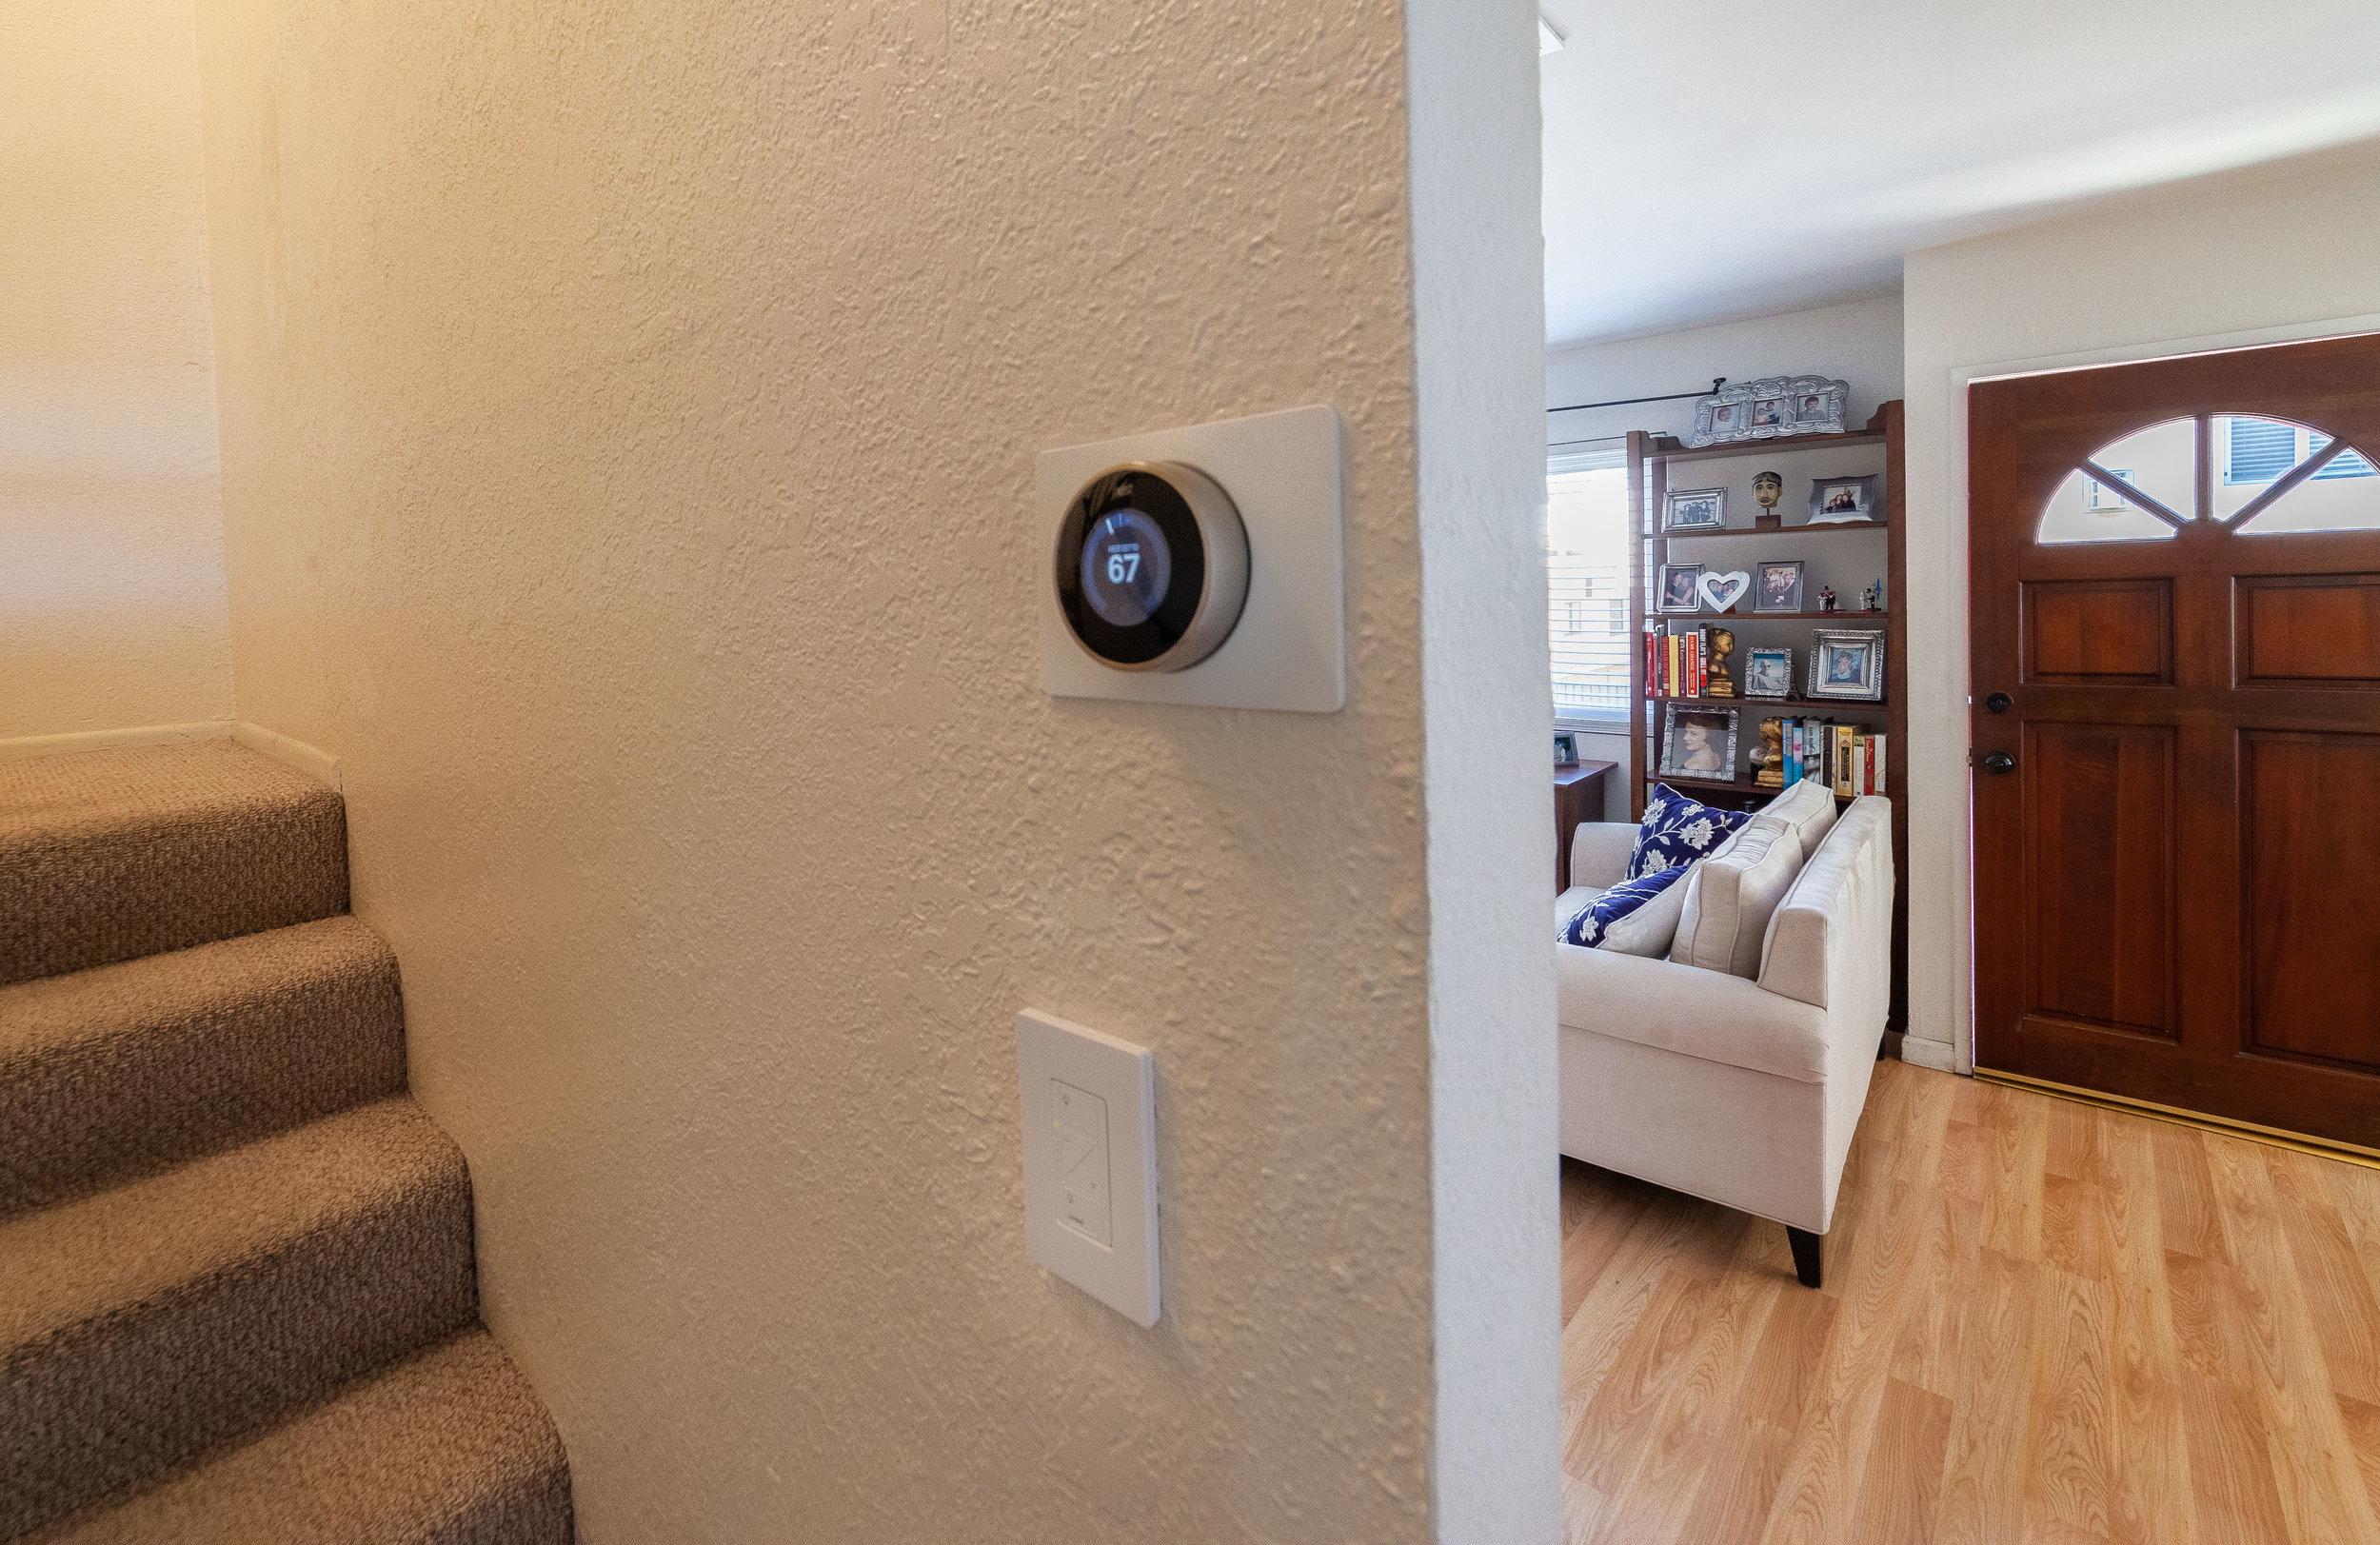 Nest-automated lights.jpg